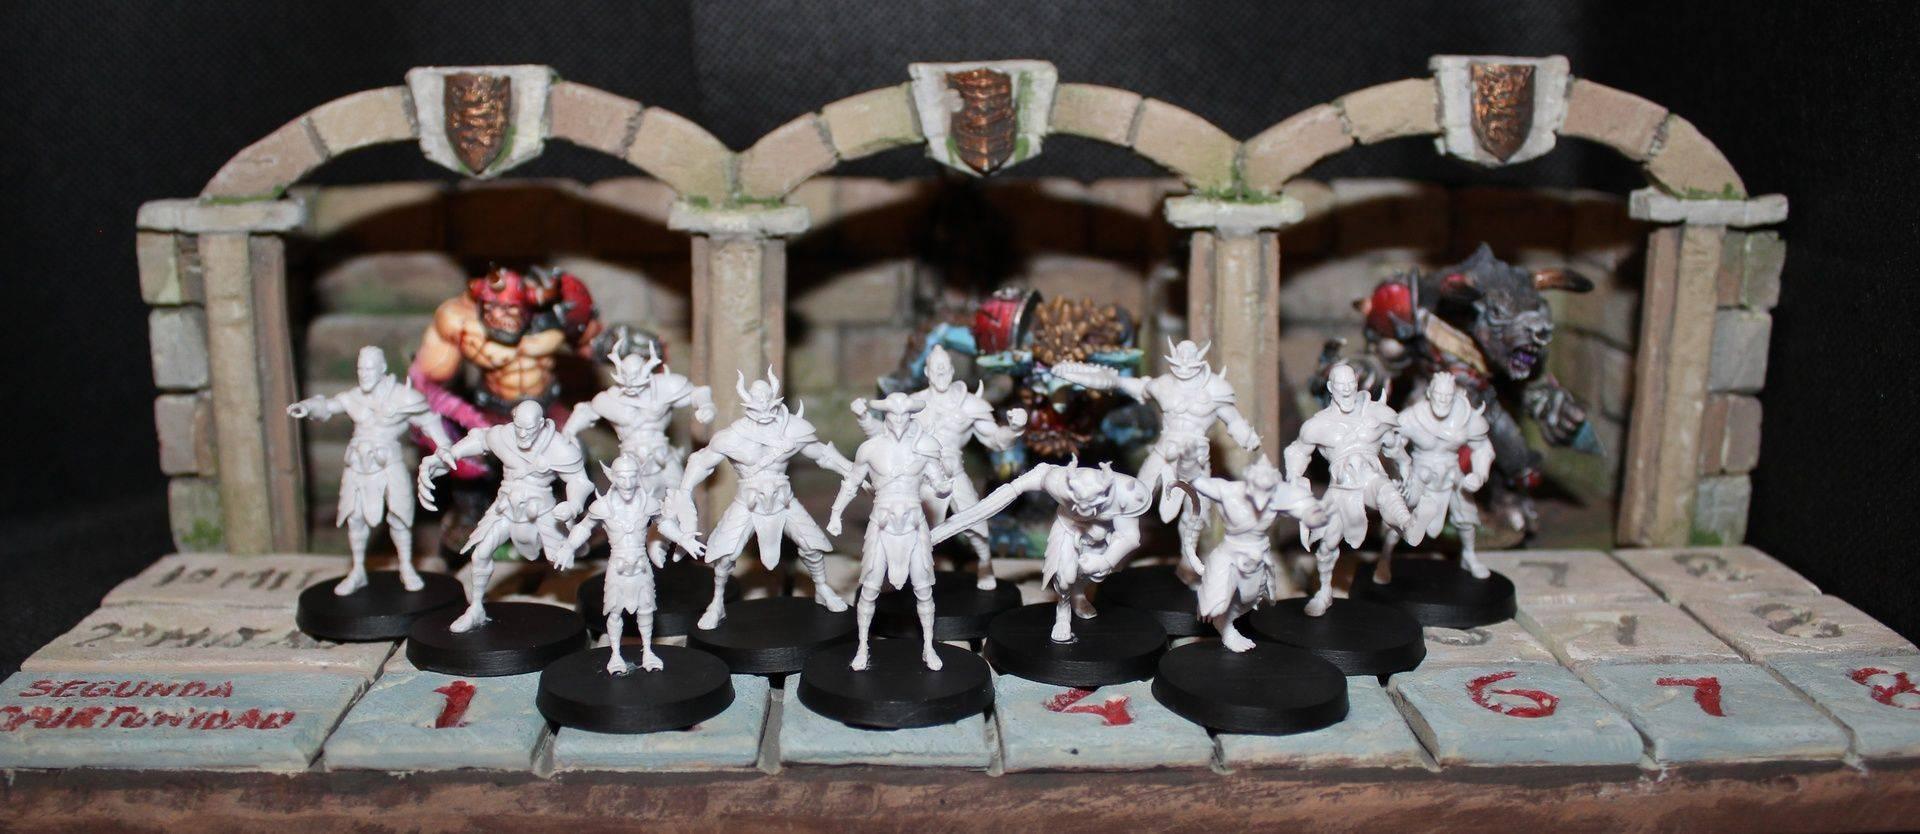 Blood bowl Miniatures 3D Print - 3D Sculpt - Resin Cast - Paint miniatures - Z-brush - Fantasy Football - Crowdfunding Manager - Online Store - Wargames